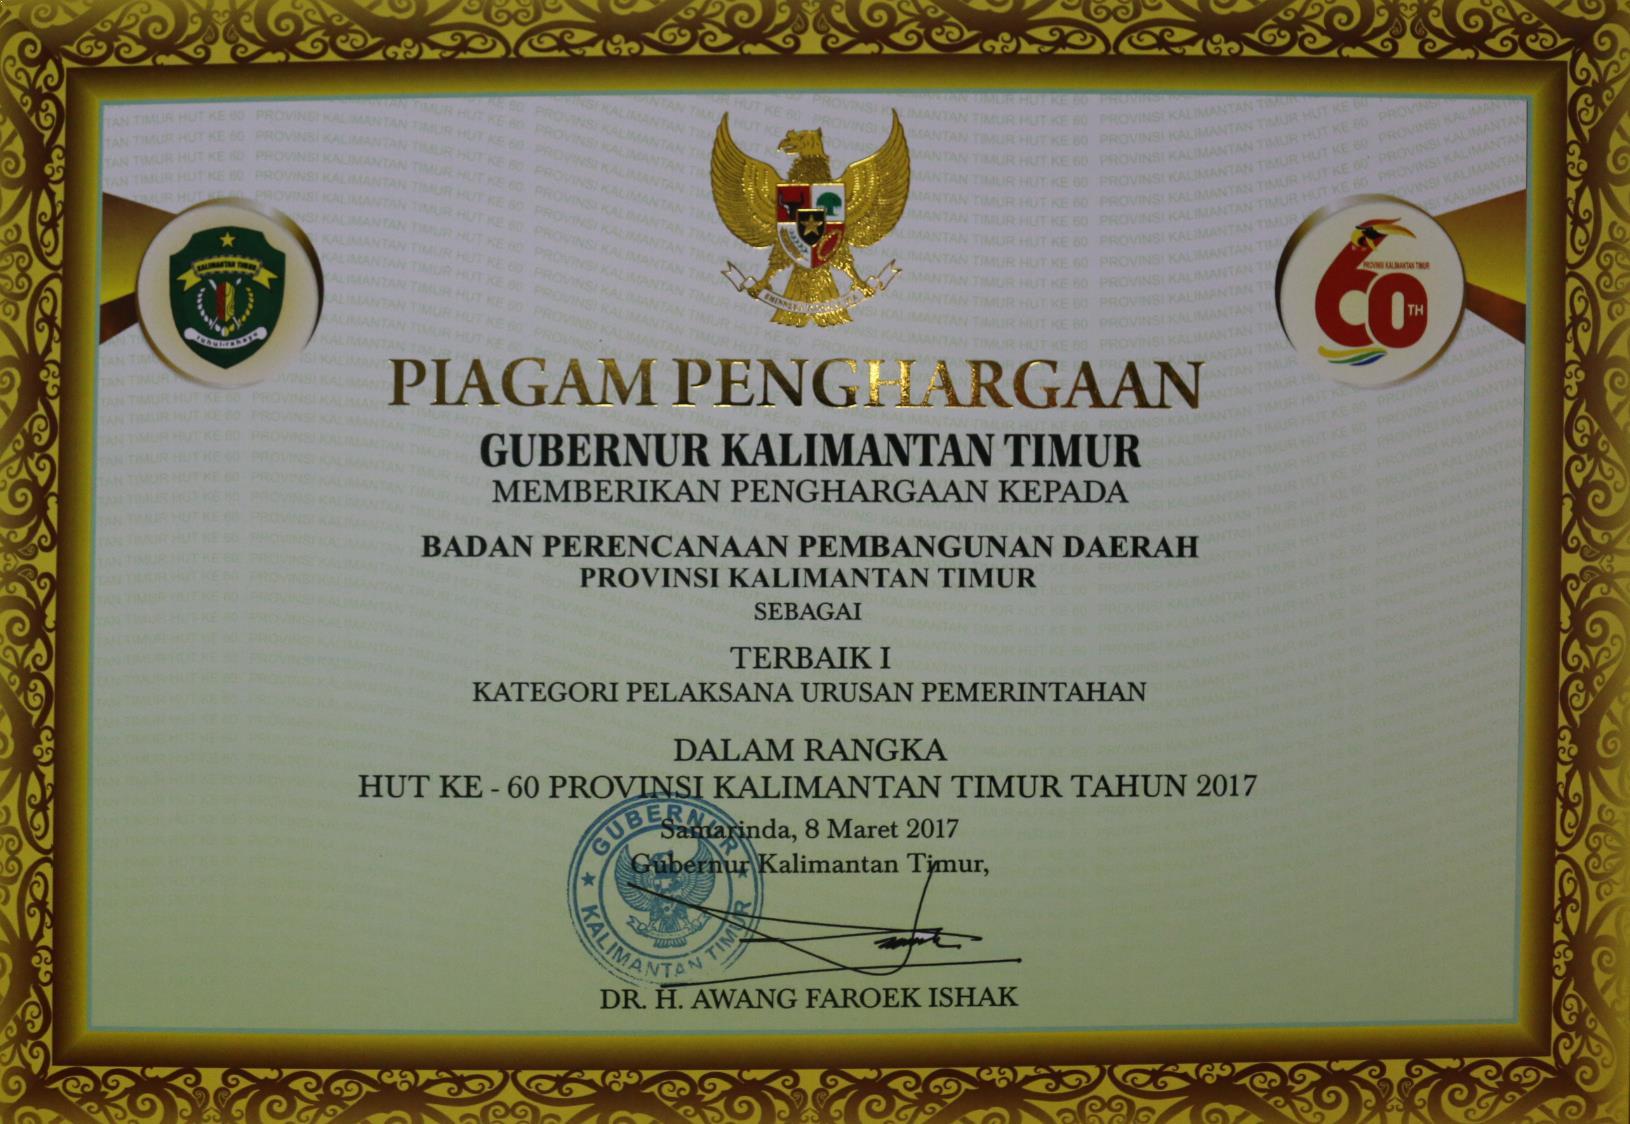 Terbaik I Pelaksana Urusan Pemerintahan dlm rangka HUT Kaltim ke 60 th 2017